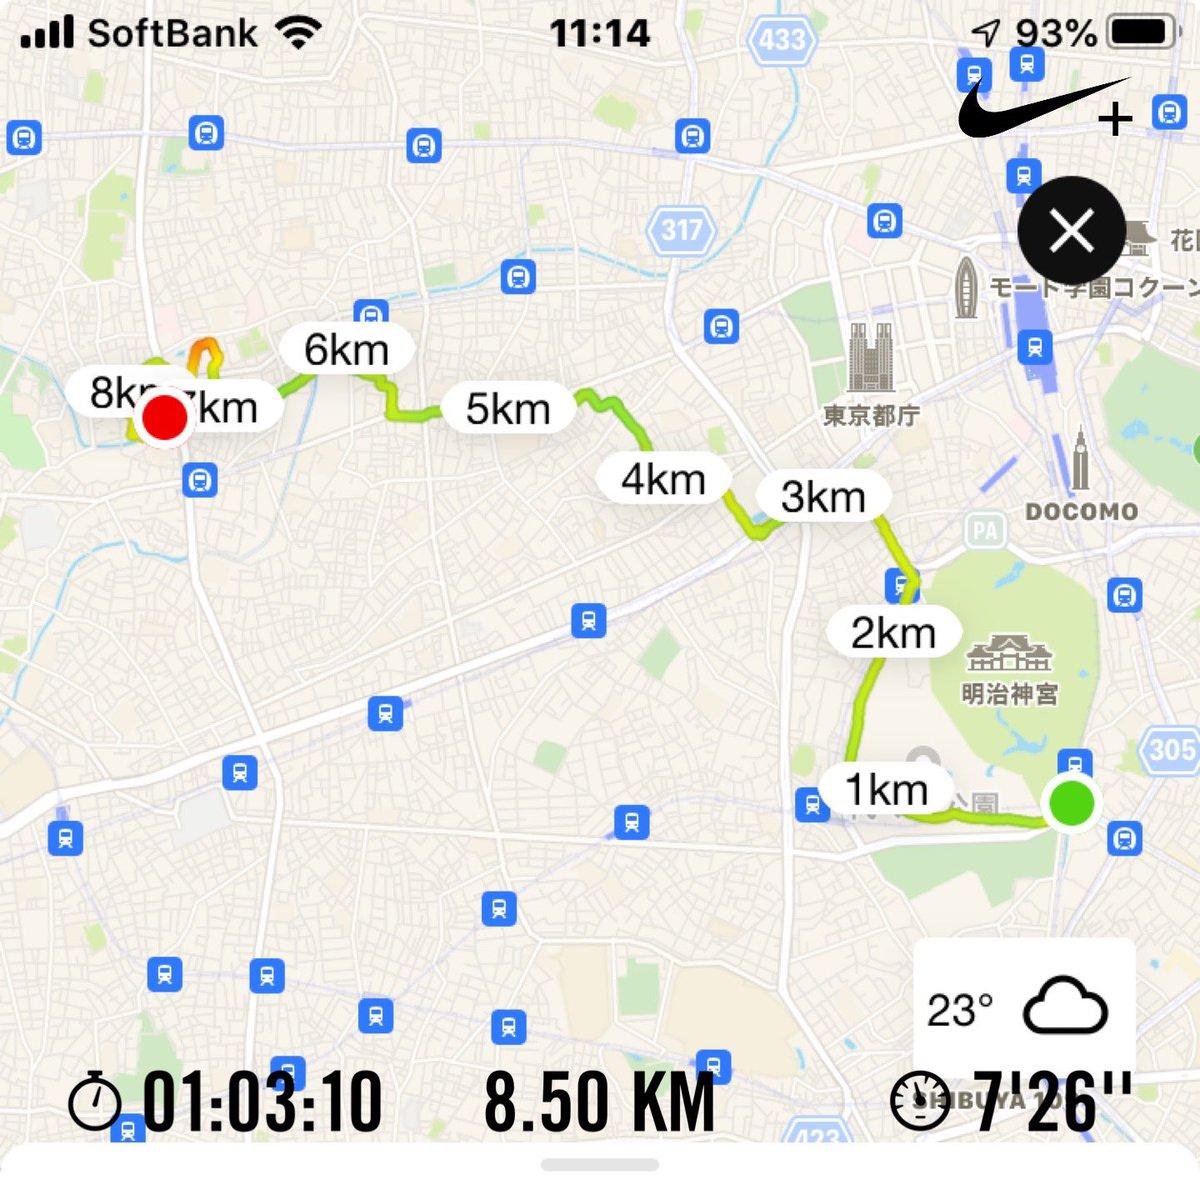 test ツイッターメディア - nikeランニングアプリGPS 8.50km  GARMINコネクトGPS 8.54km  ポケモンGOジョギング 9.0km (12231.2-12222.2)  🏃♀️ 代々木公園よりラン帰宅 天気は曇り 少し暑い程度でなんとか走れたづら 🏃♀️  #NRC #nikerunning #nikeplus #GARMIN #pokemongo #ポケモンGO #ランニング https://t.co/AFK3ZBlAuX